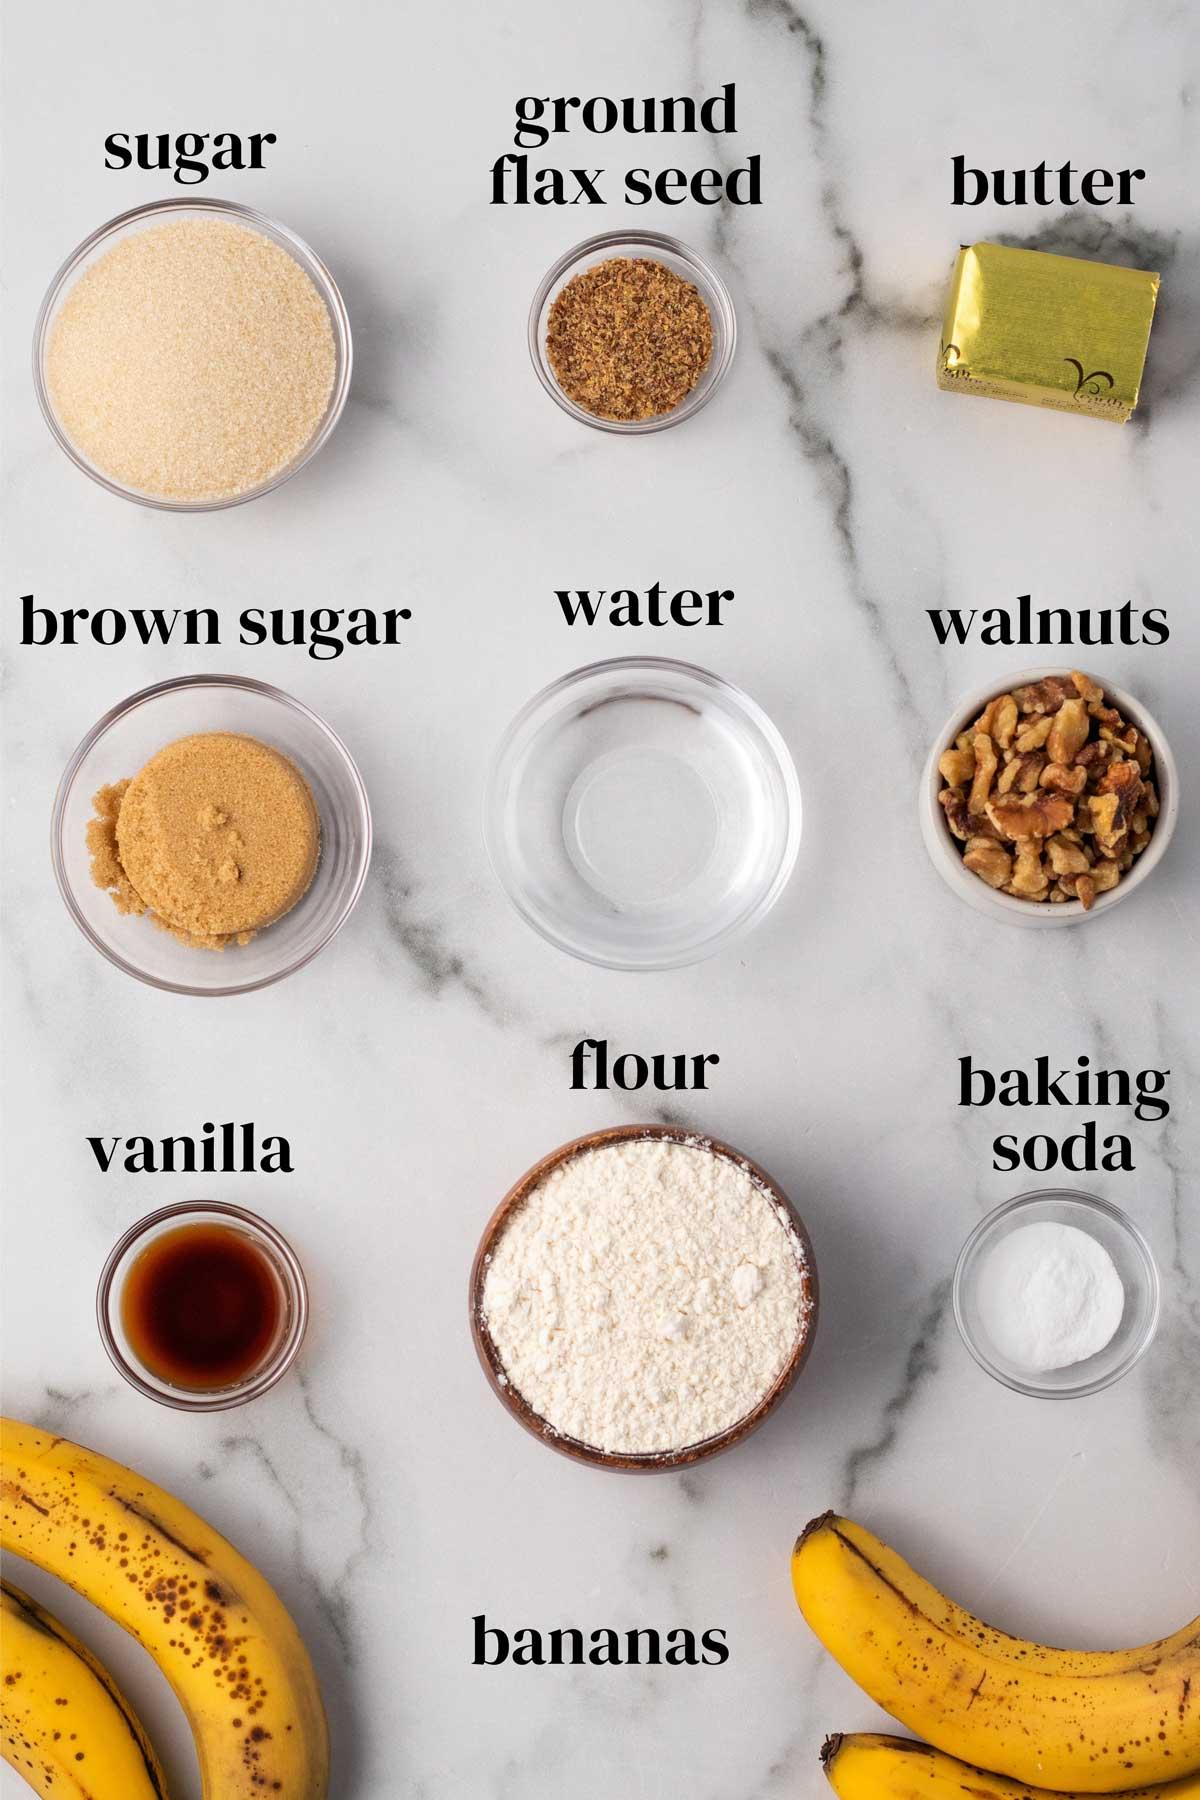 Ingredients to bake vegan banana walnut muffins with flour, sugar, baking soda, vanilla and bananas